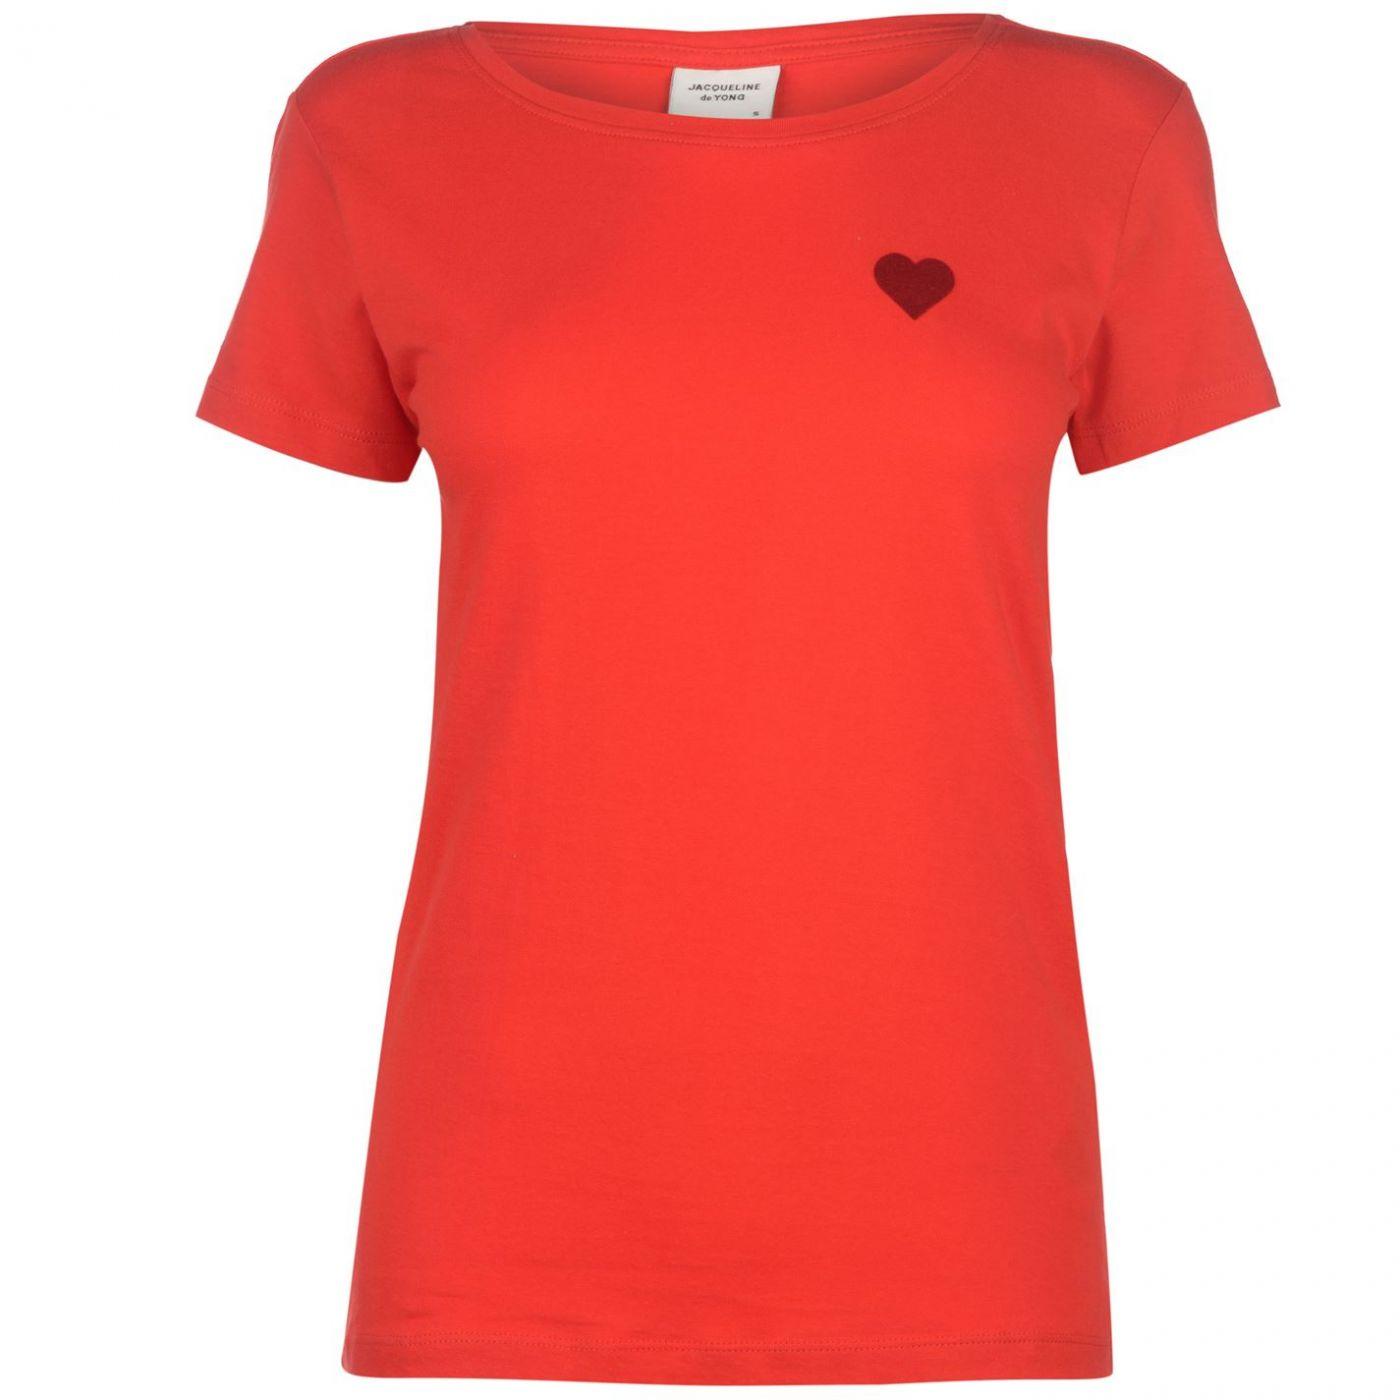 JDY Chicago Short Sleeve T Shirt